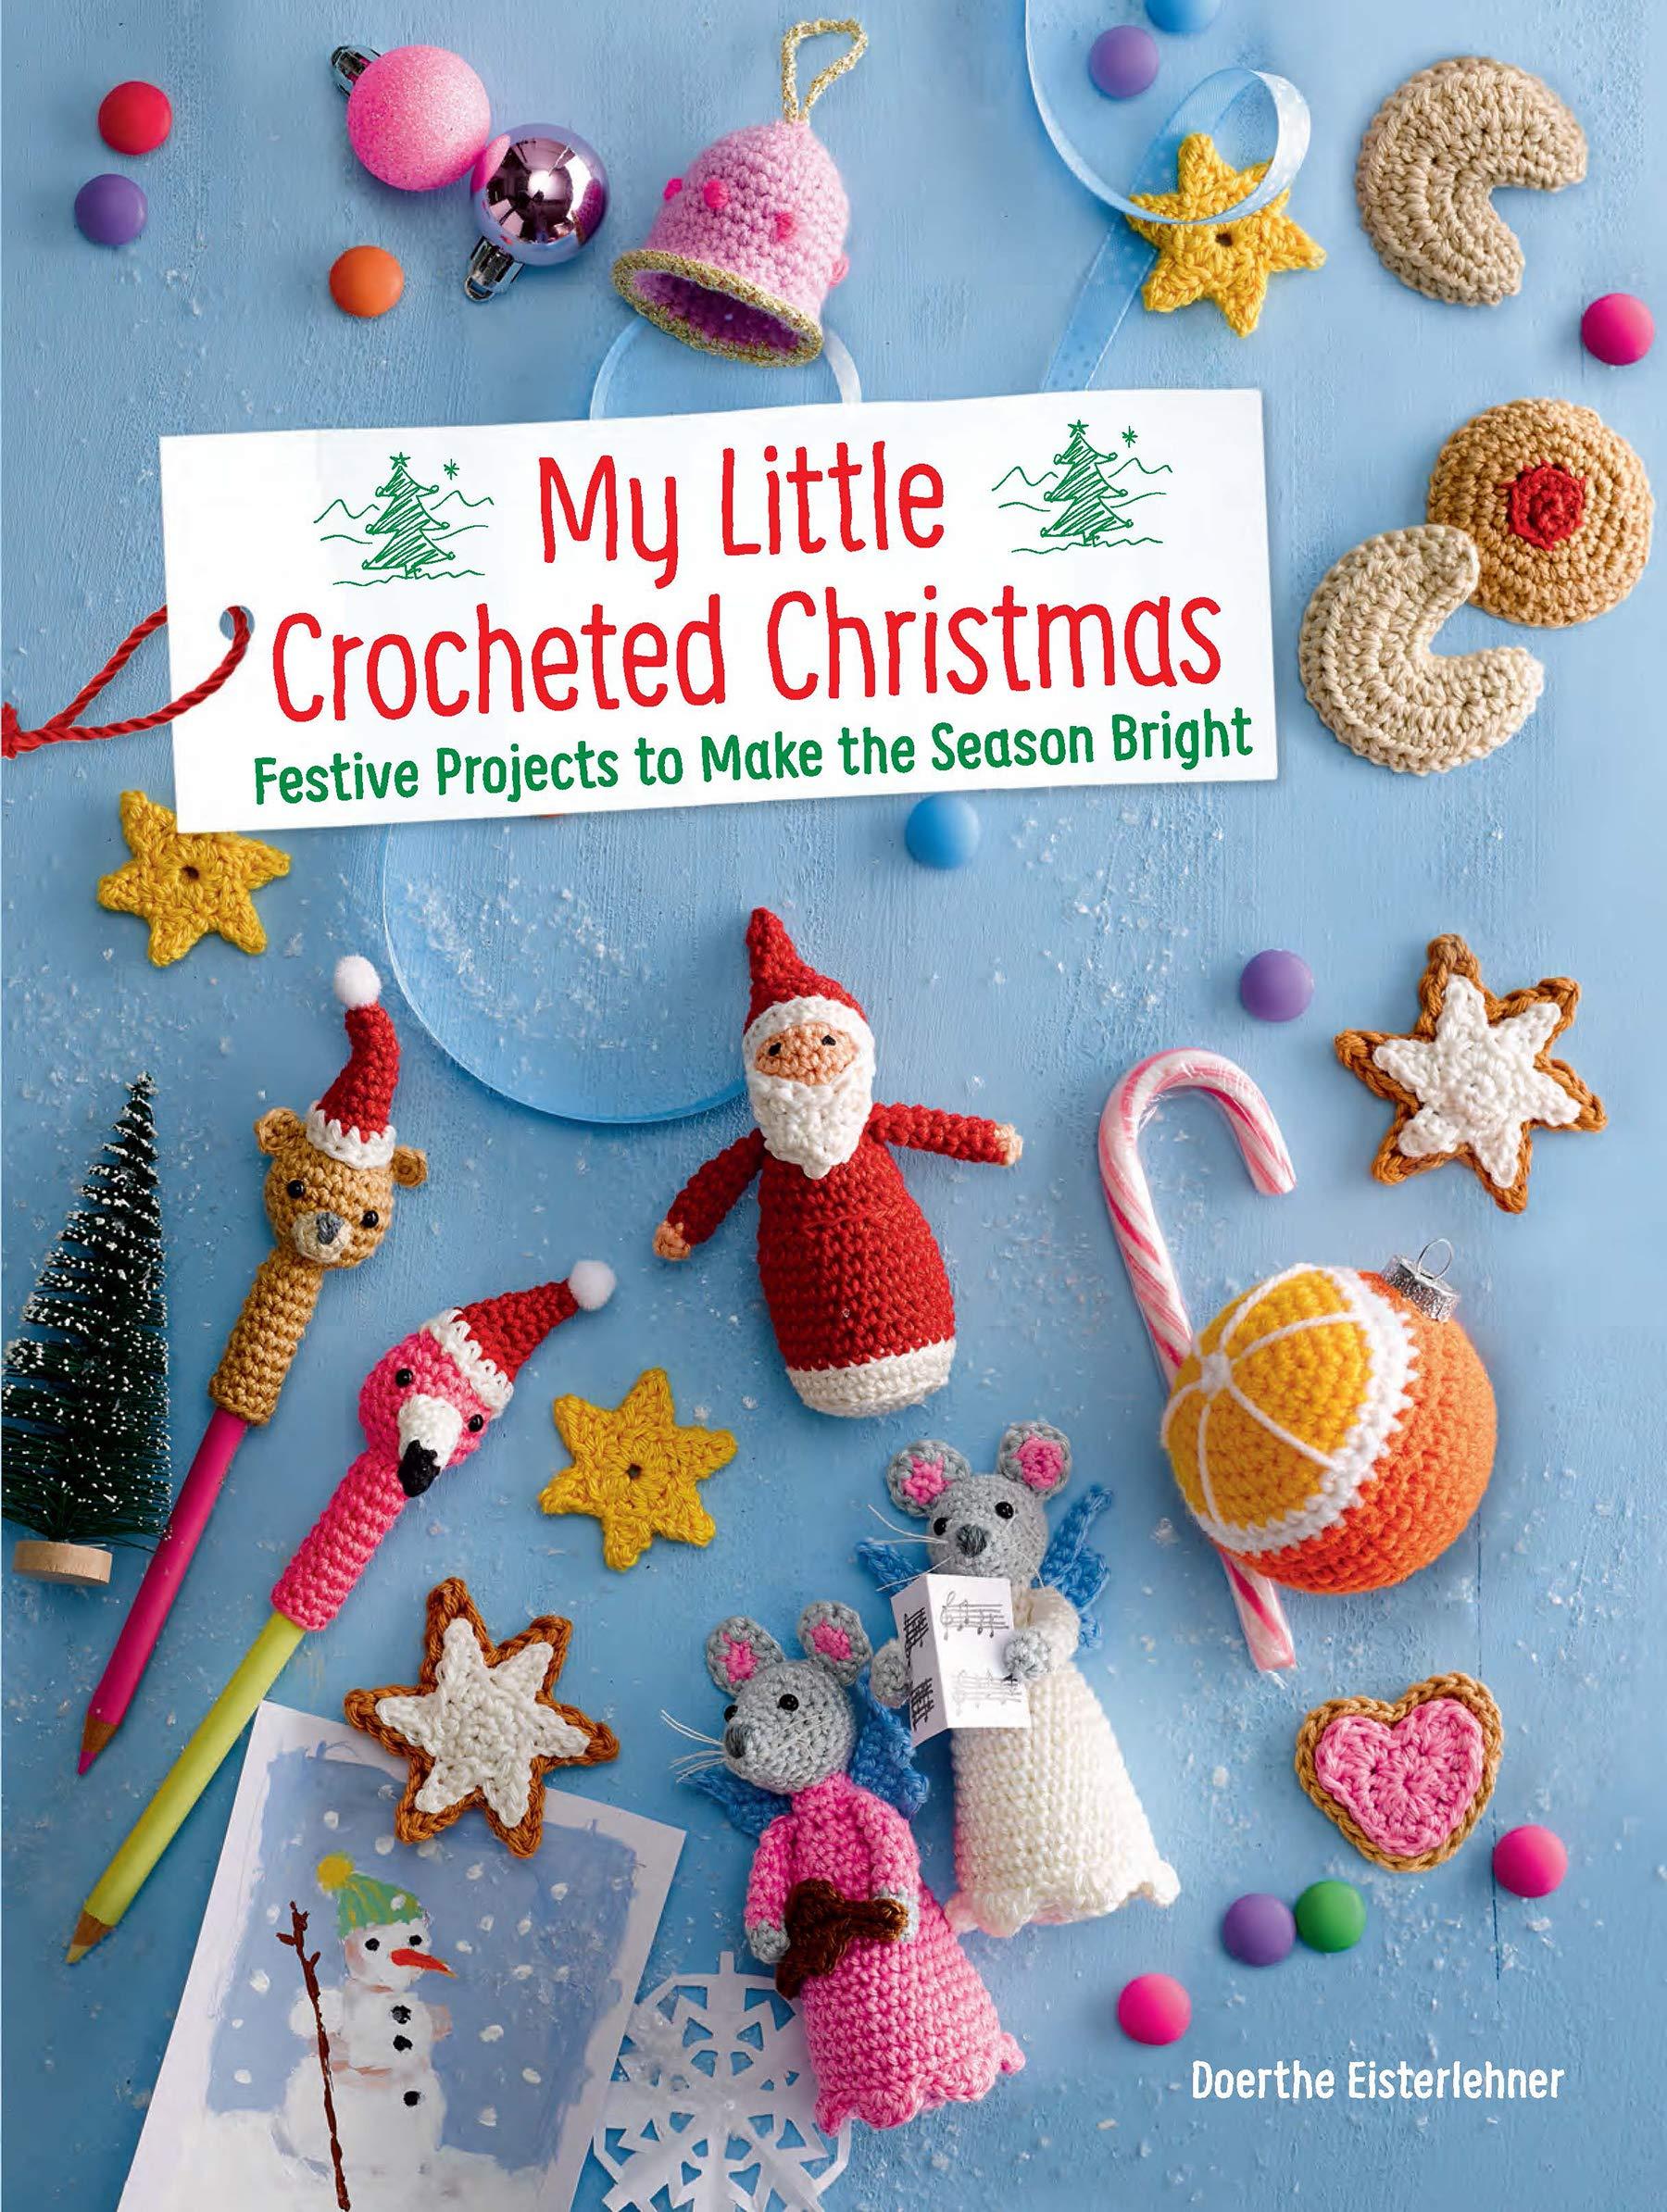 Crochet the Manger this Season - Free Pattern | Christmas crochet ... | 2389x1800